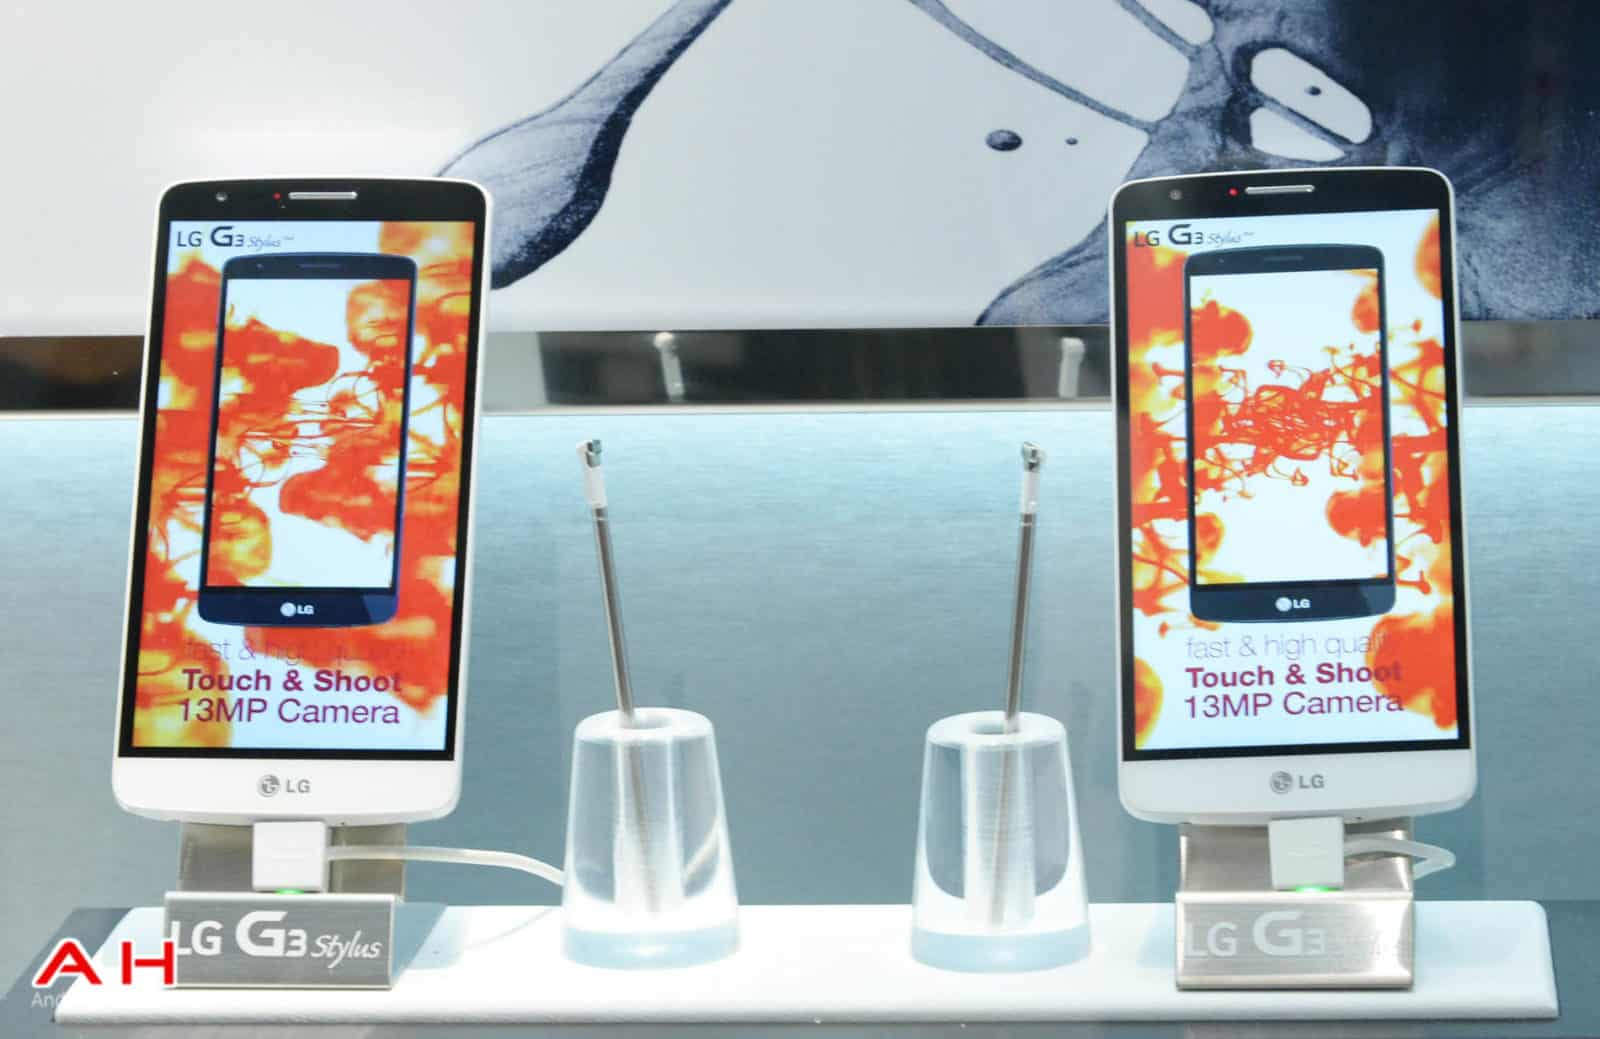 LG G3 Stylus 3